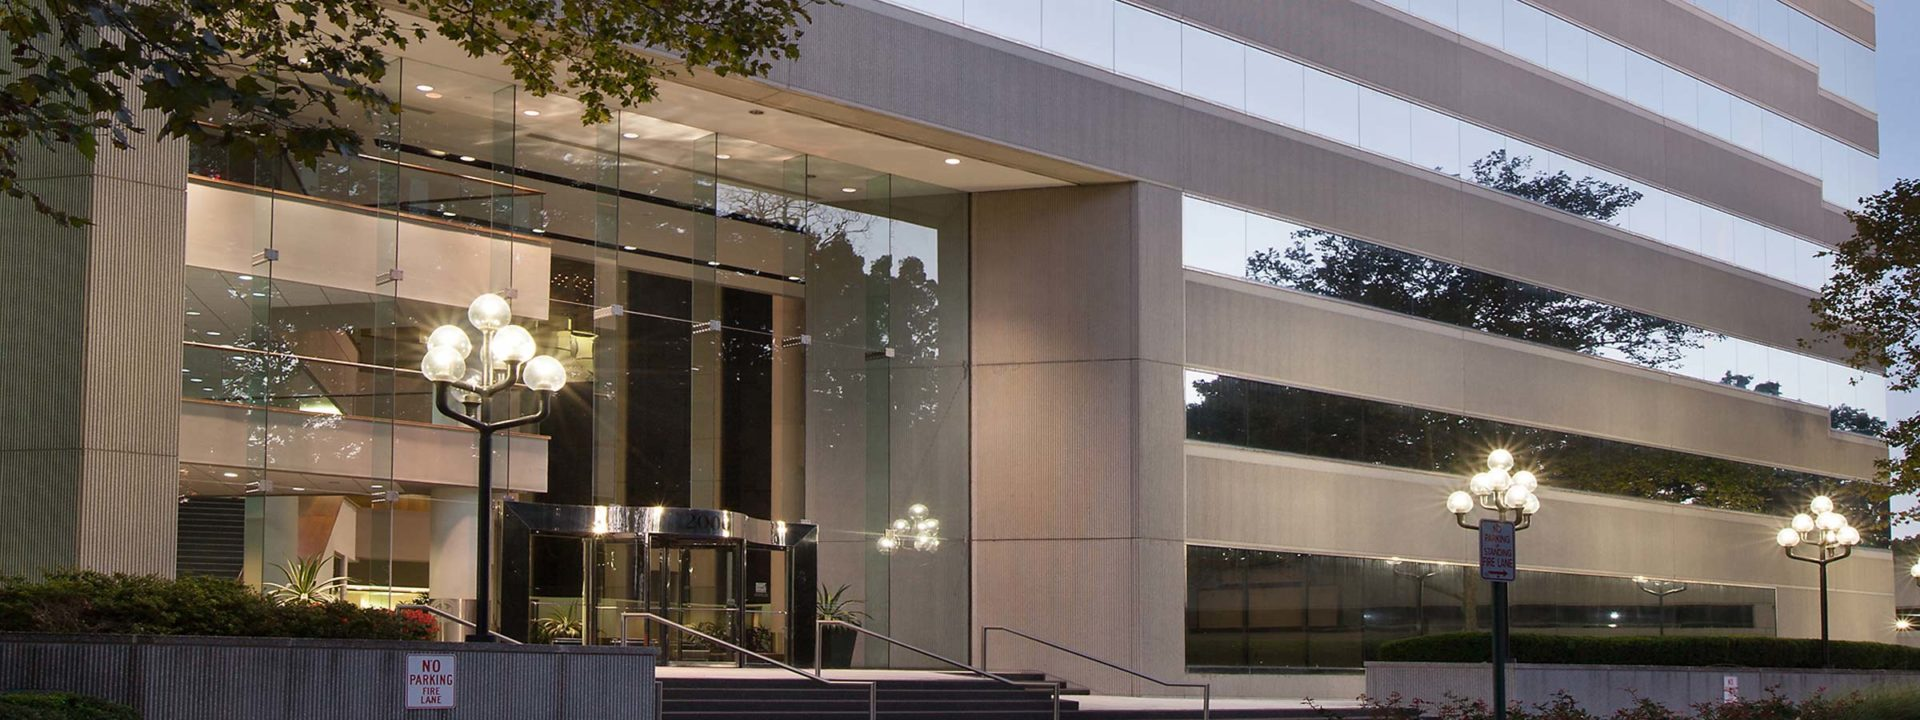 Corporate Ridge Cambridge Commercial Property Management Virginia